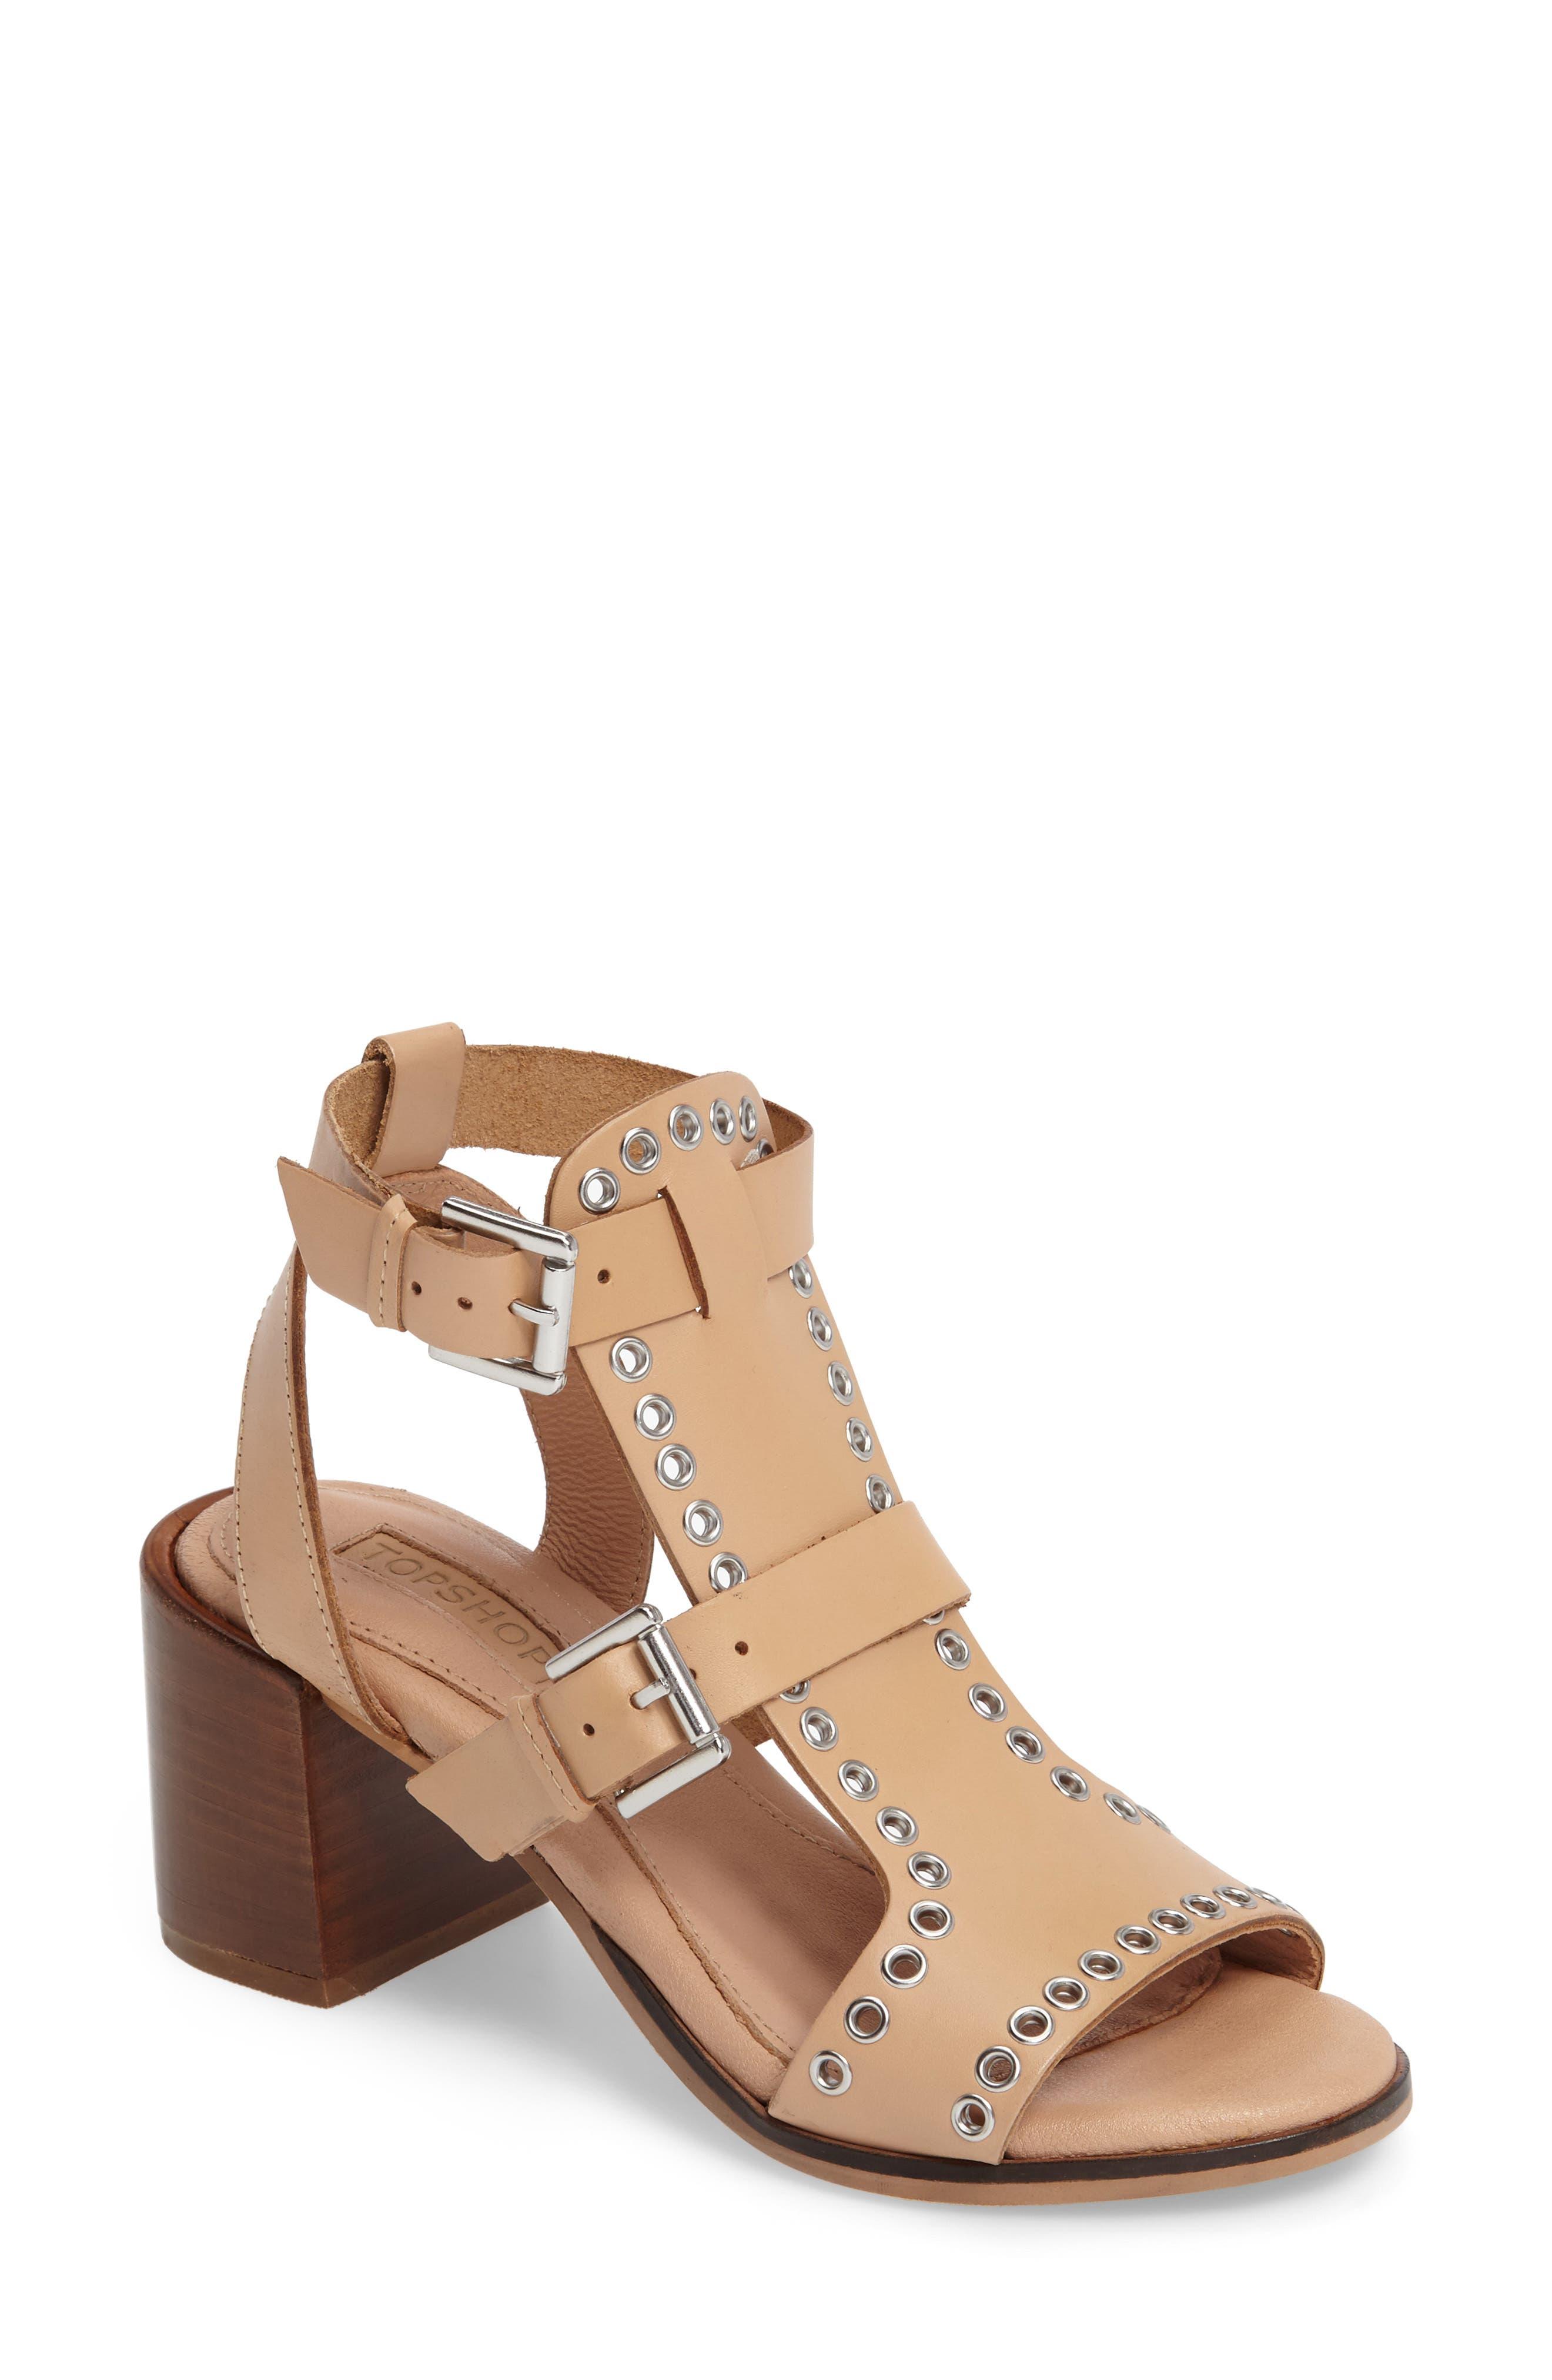 Alternate Image 1 Selected - Topshop Vienna Grommet Sandal (Women)